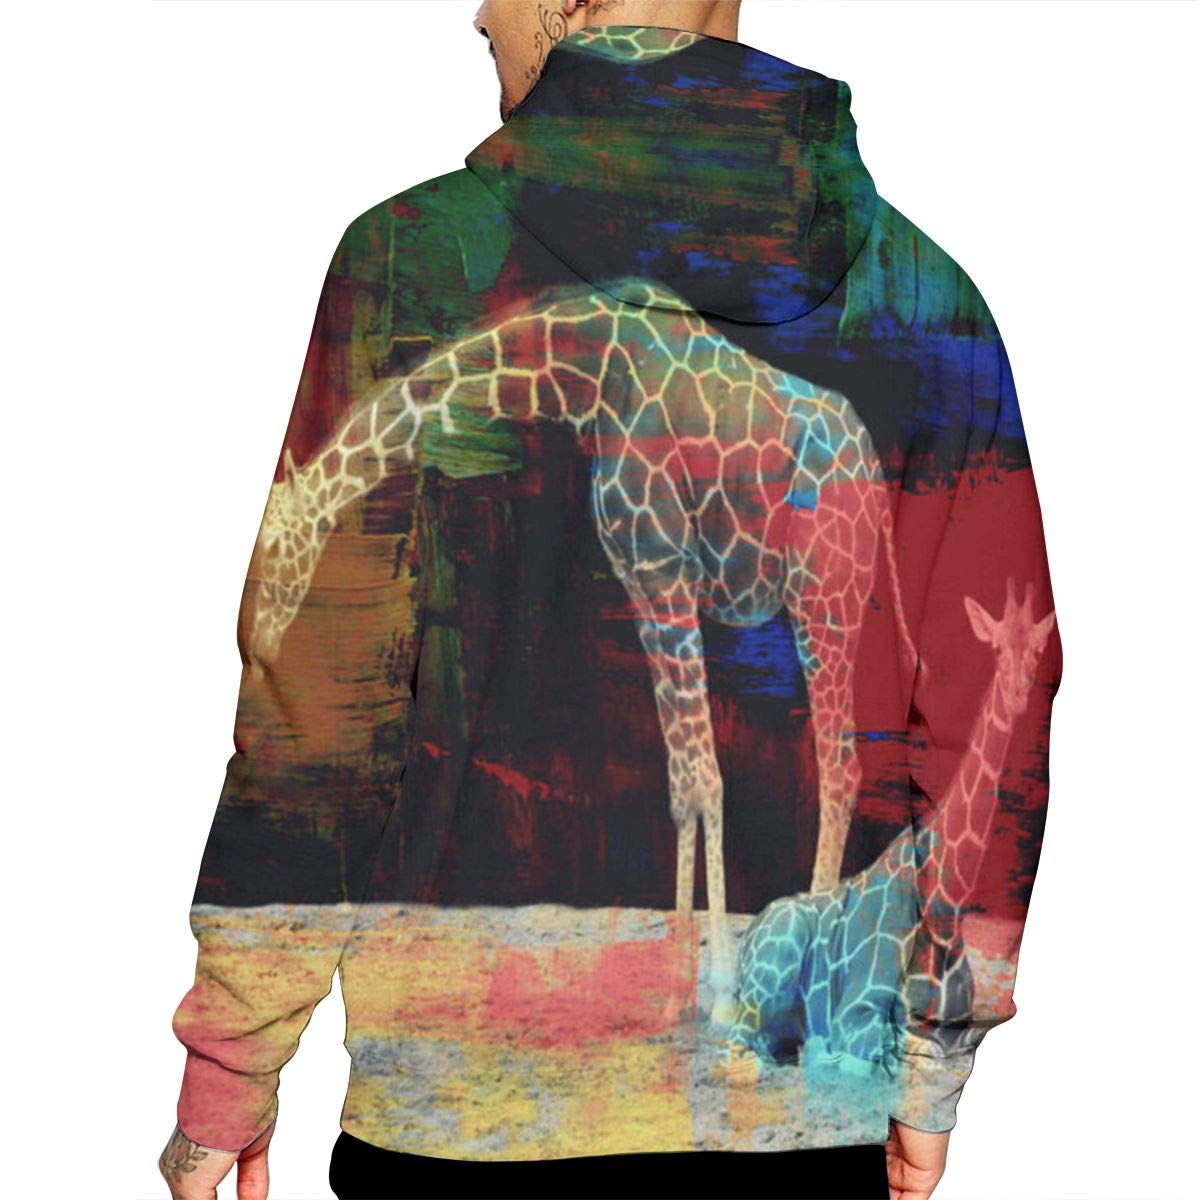 CHETI Giraffe Mens Pullover Hoodies Hooded Sweatshirts